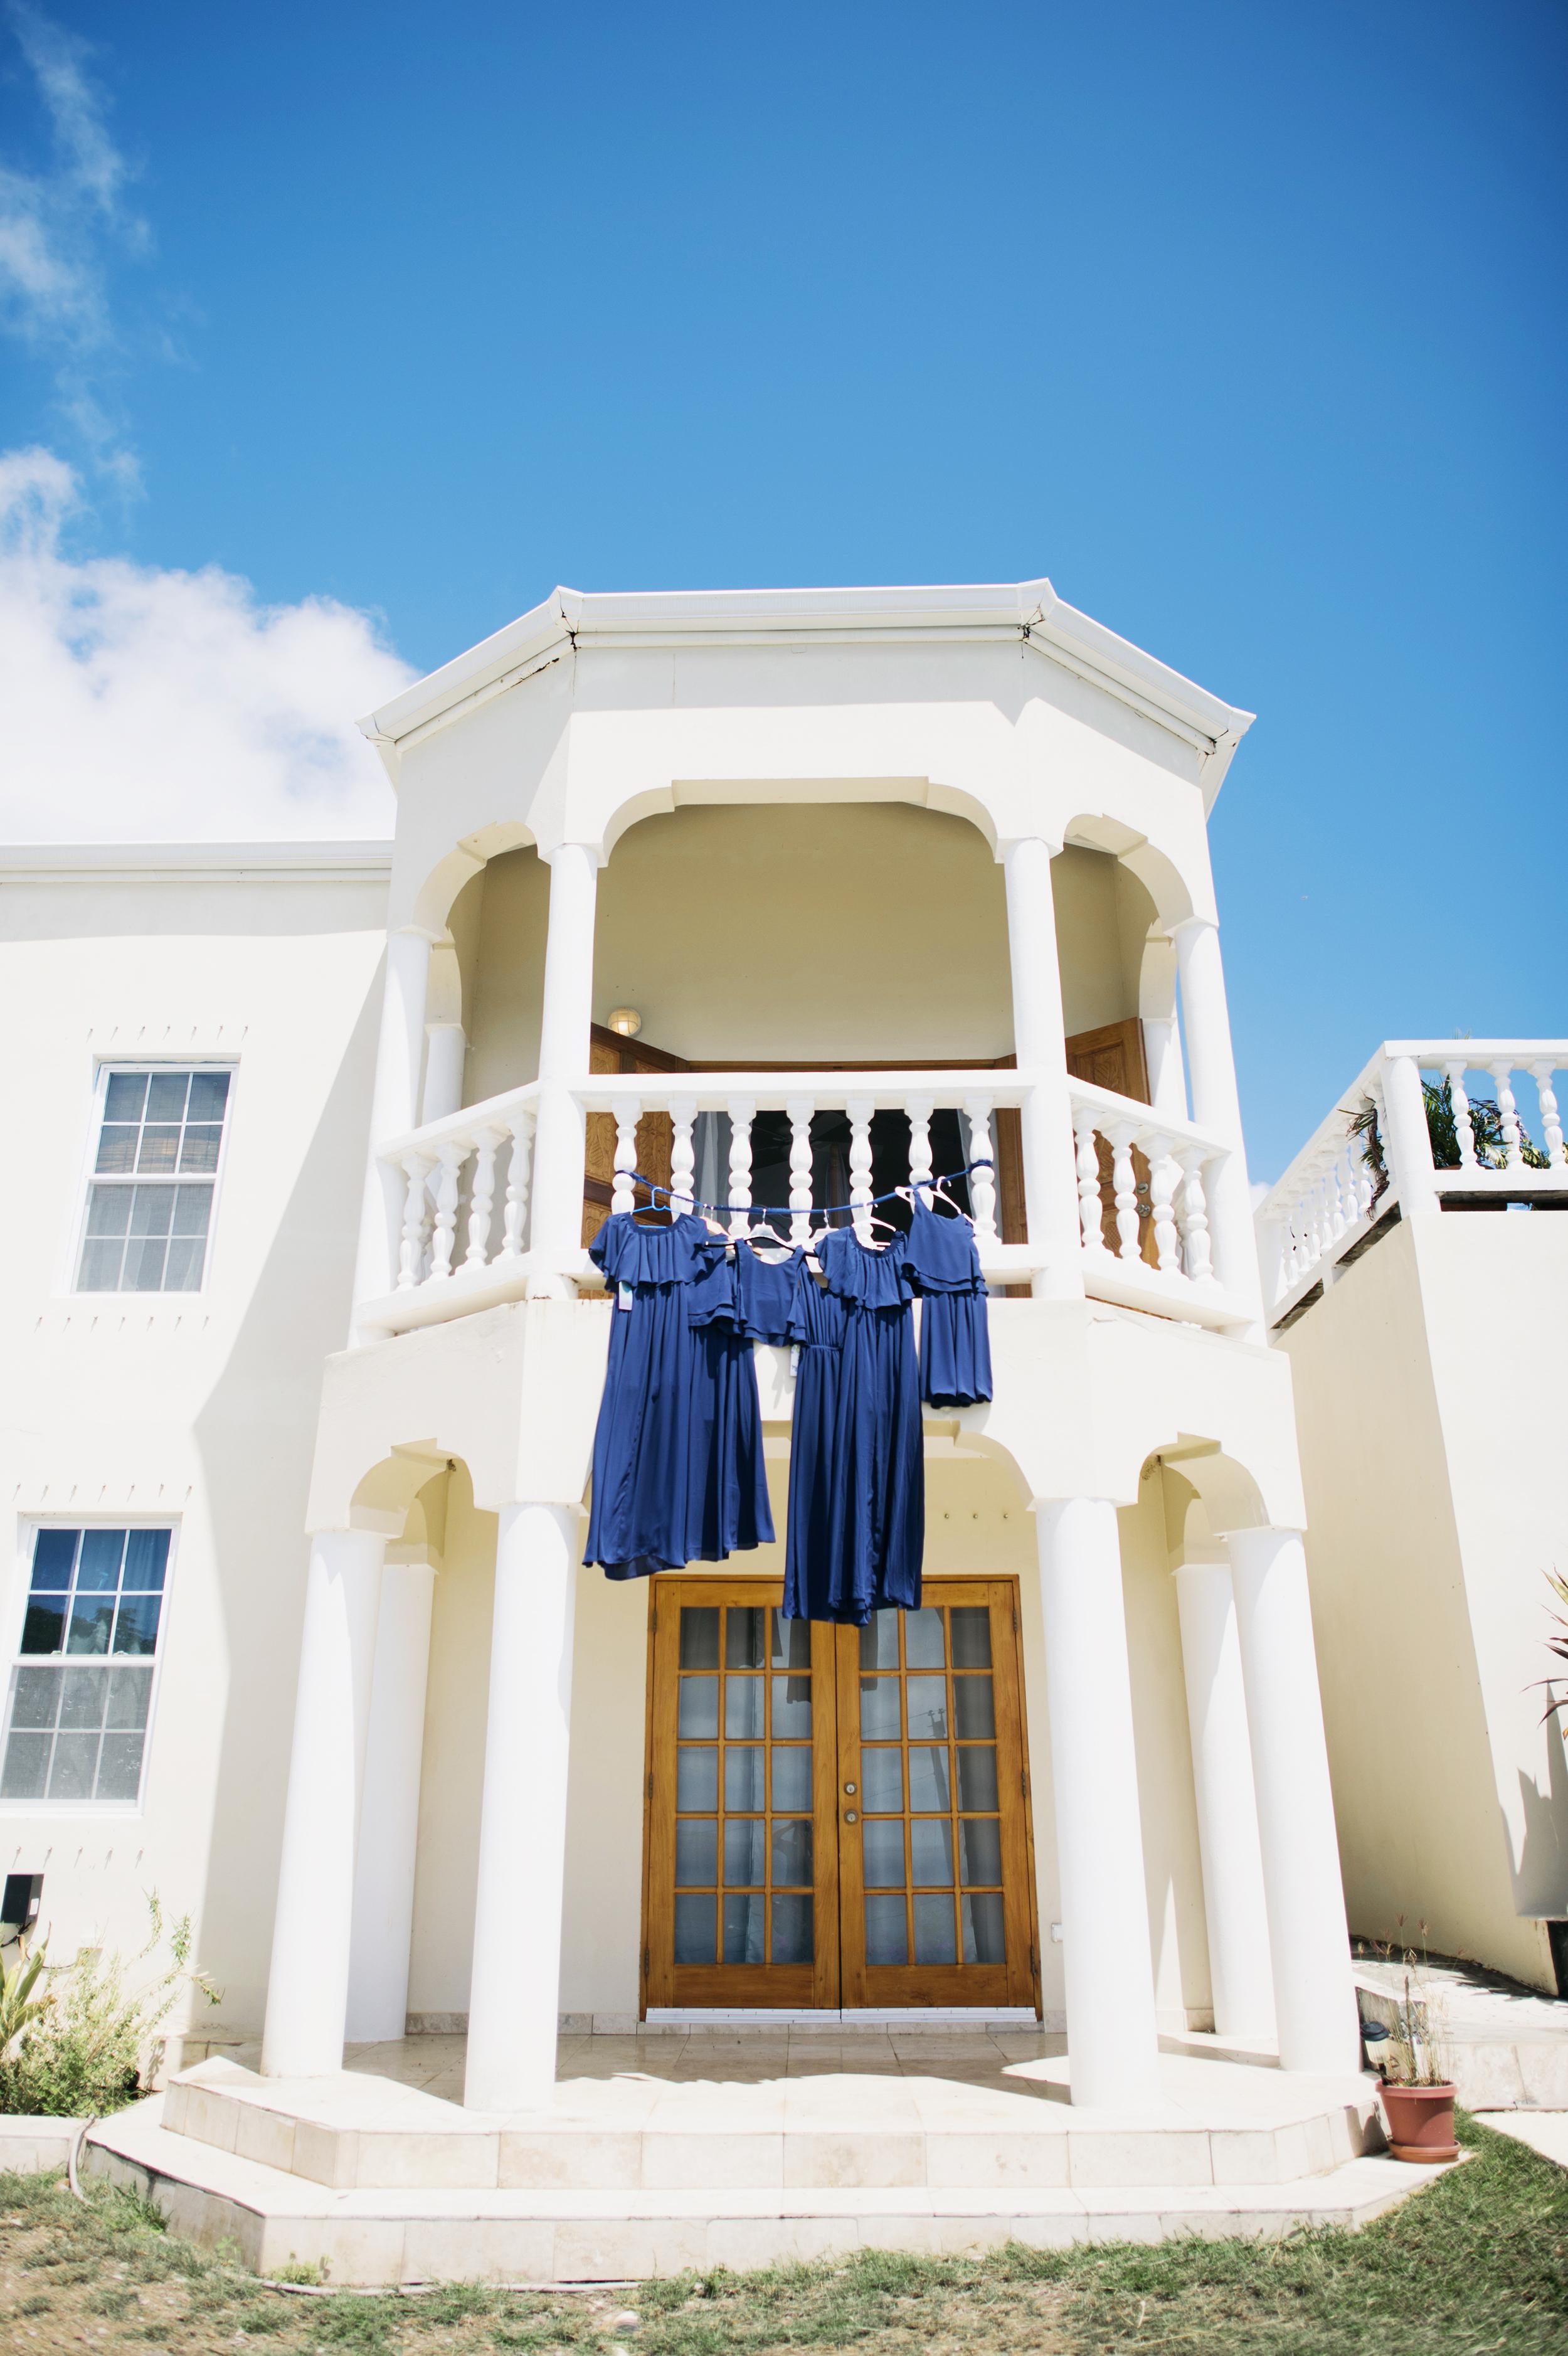 wedding dresses hang of balcony in st thomas VI